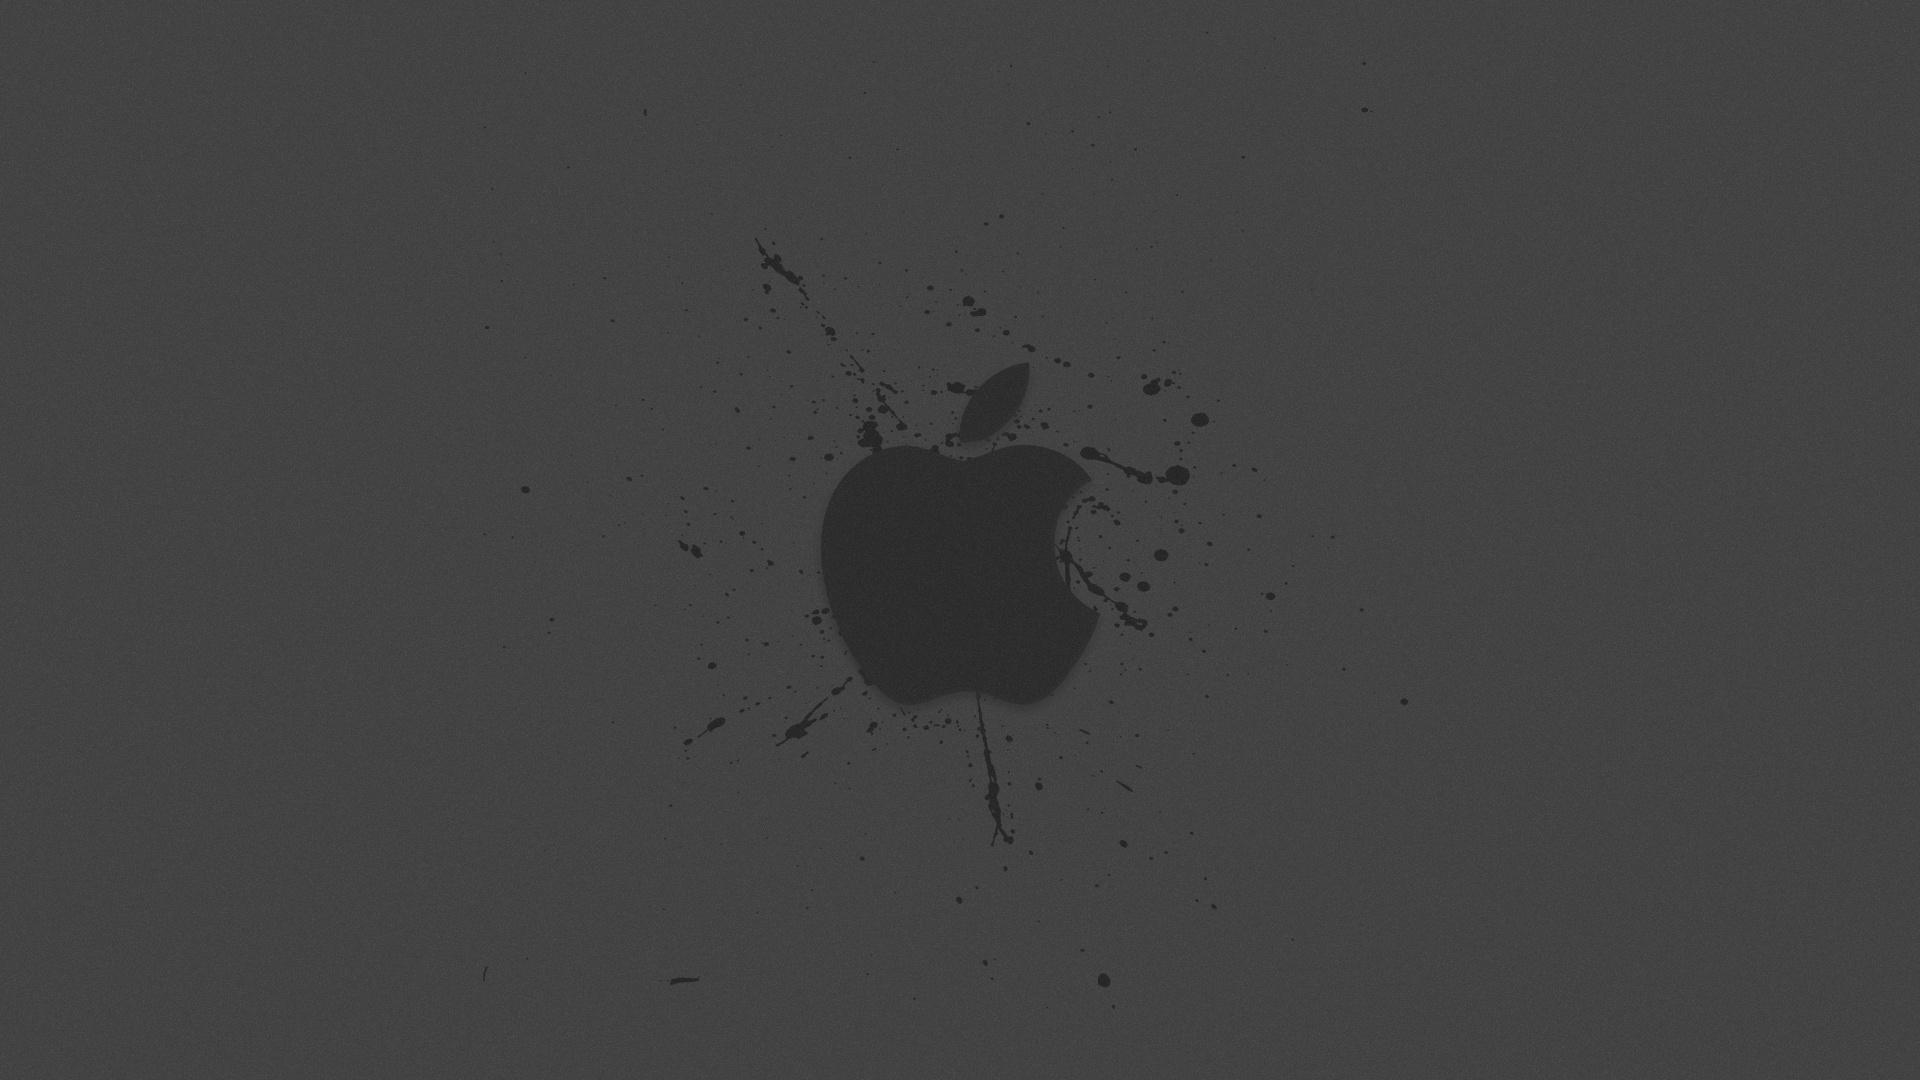 http://2.bp.blogspot.com/-9qP5dWNQGxo/UDeM_63qn2I/AAAAAAAAD0k/mhL-cWYro9w/s1920/clean_apple_wallpaper_hd-1080.jpg